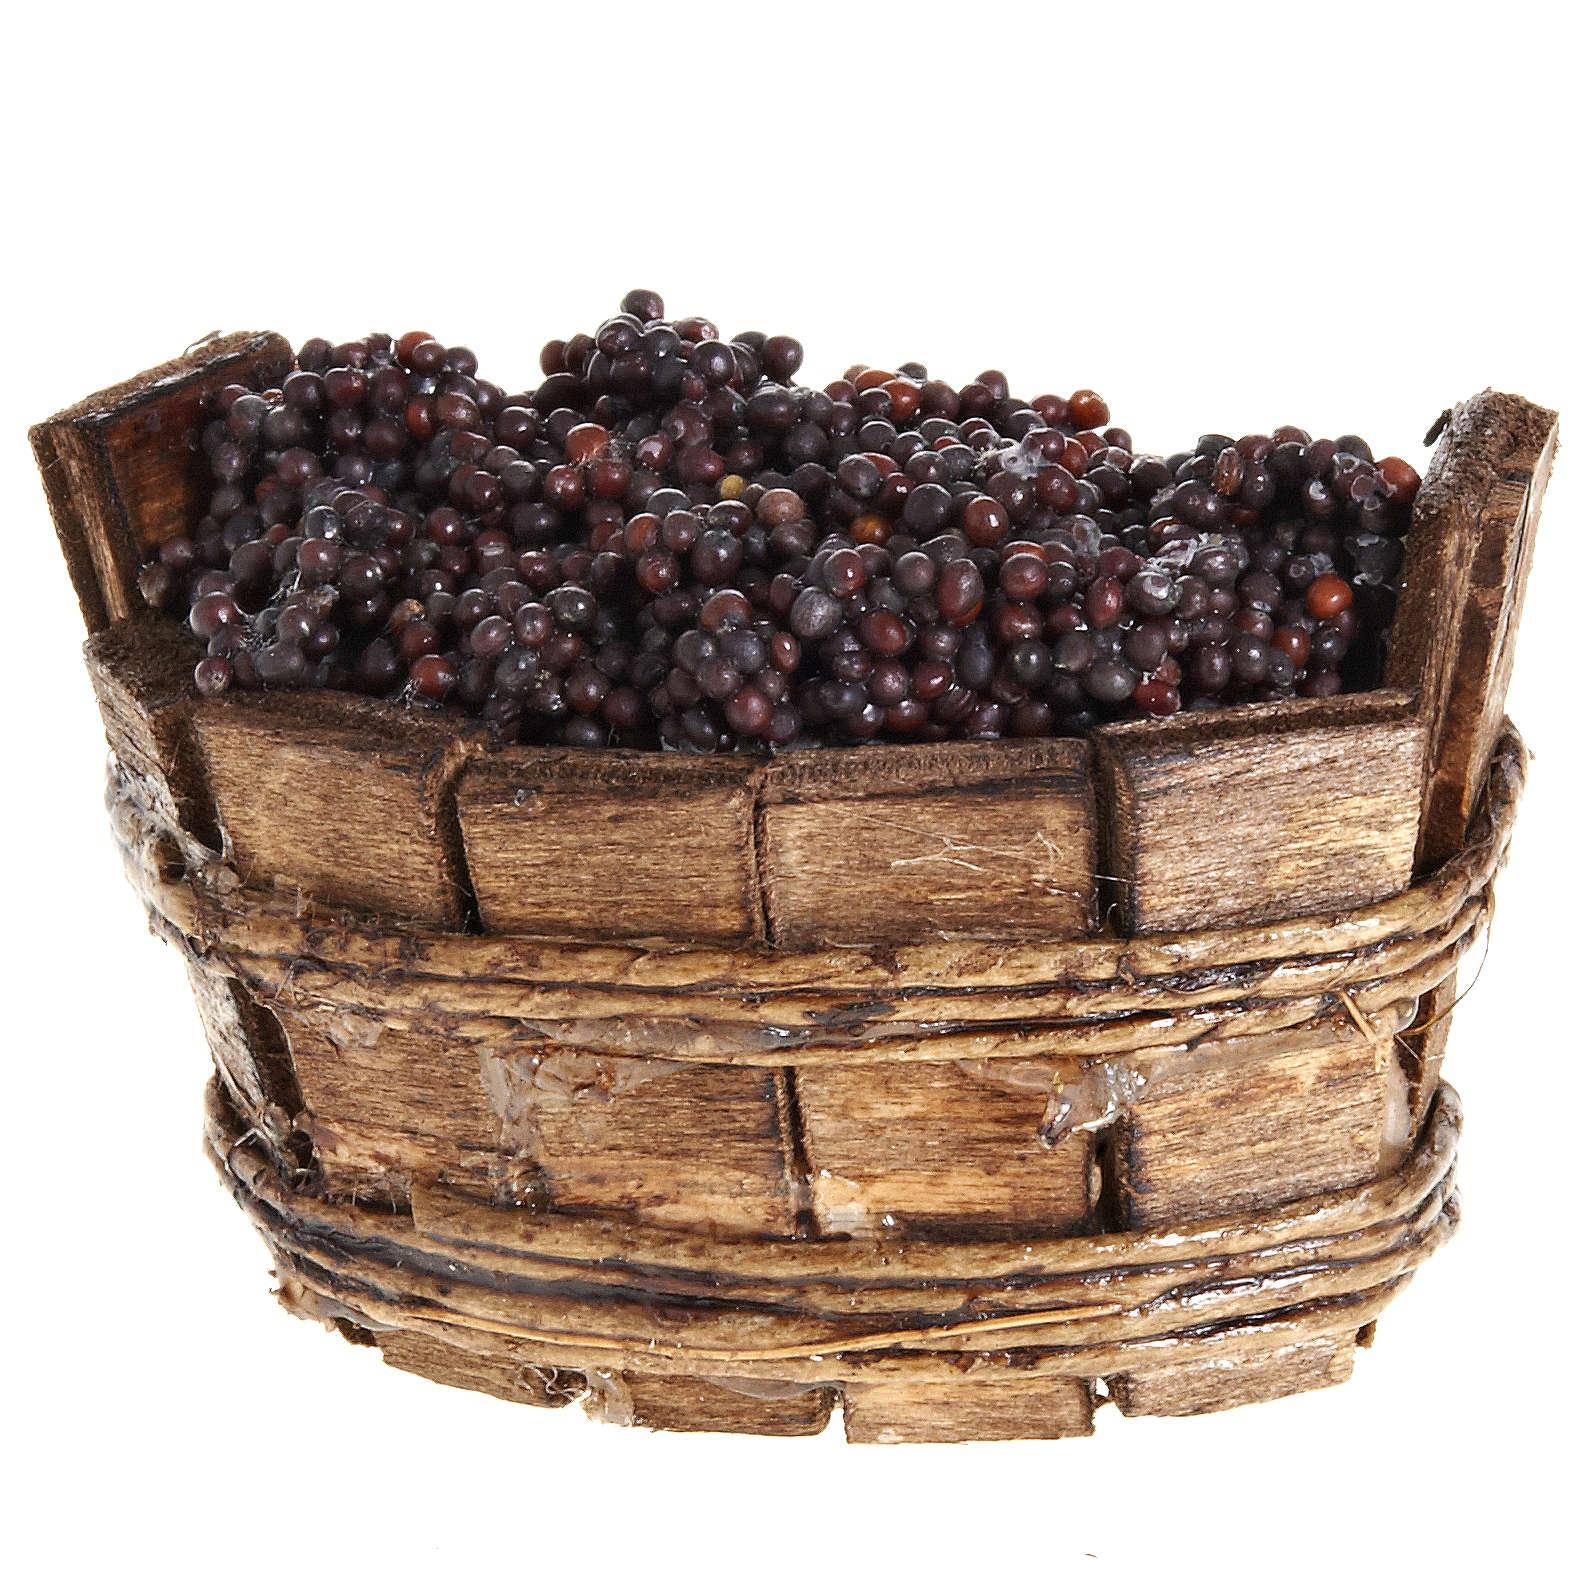 Tinozza ovale uva nera presepe Napoli 4